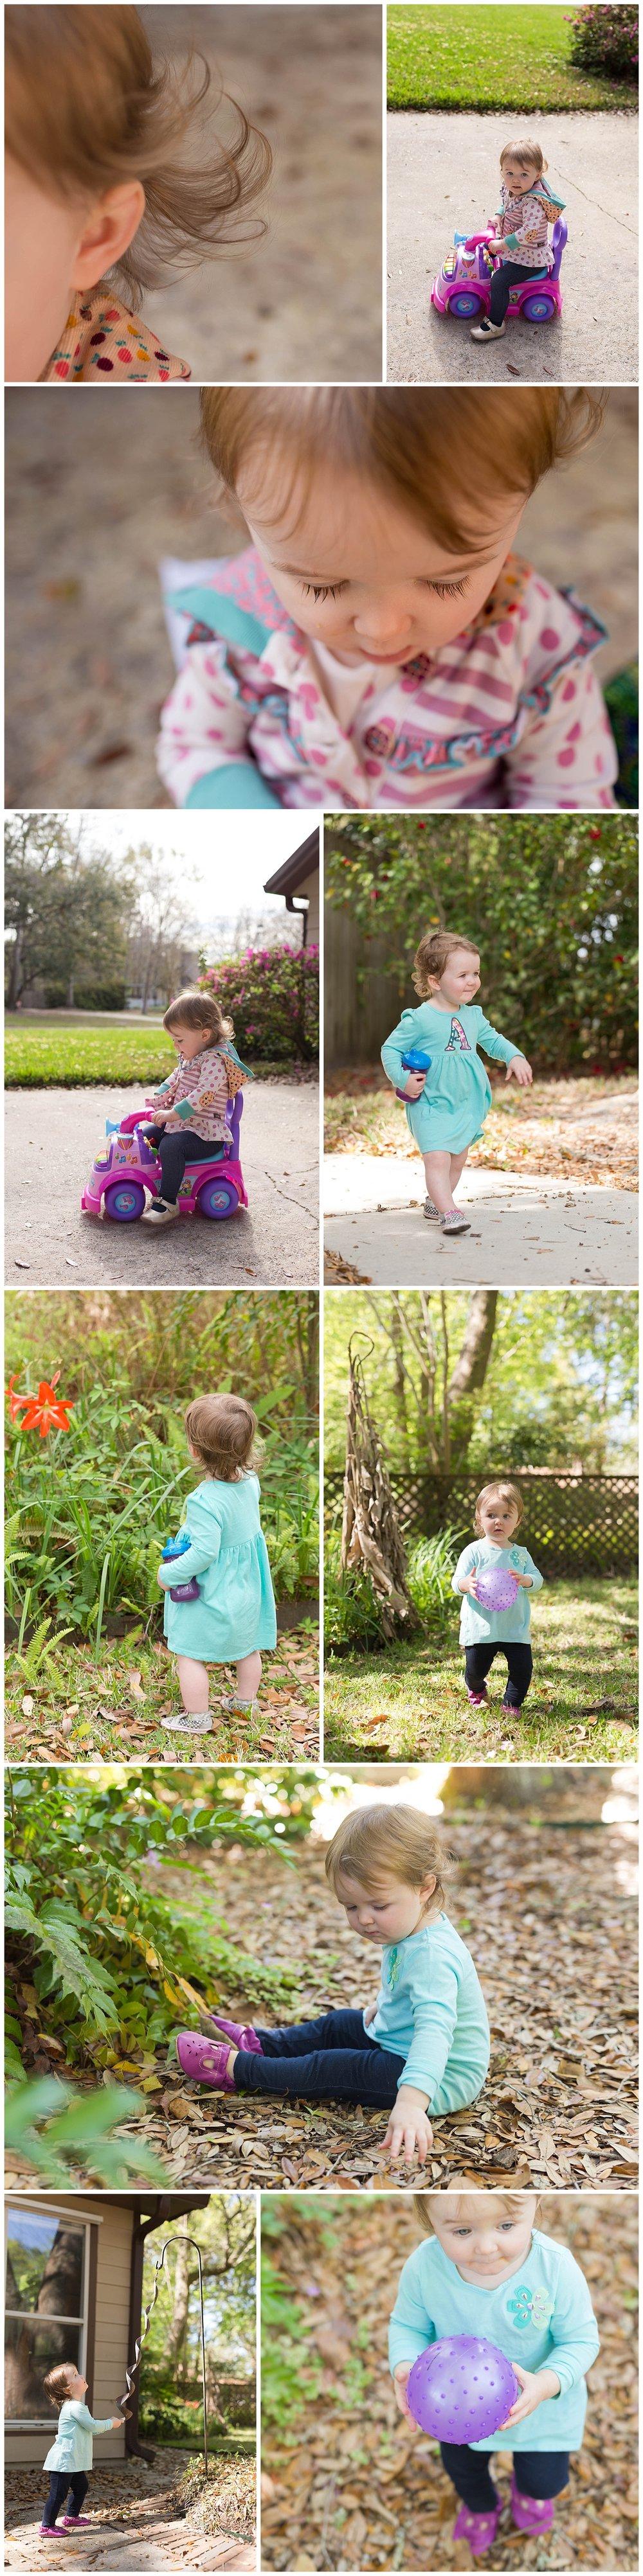 little girl playing outside in Ocean Springs, Mississippi